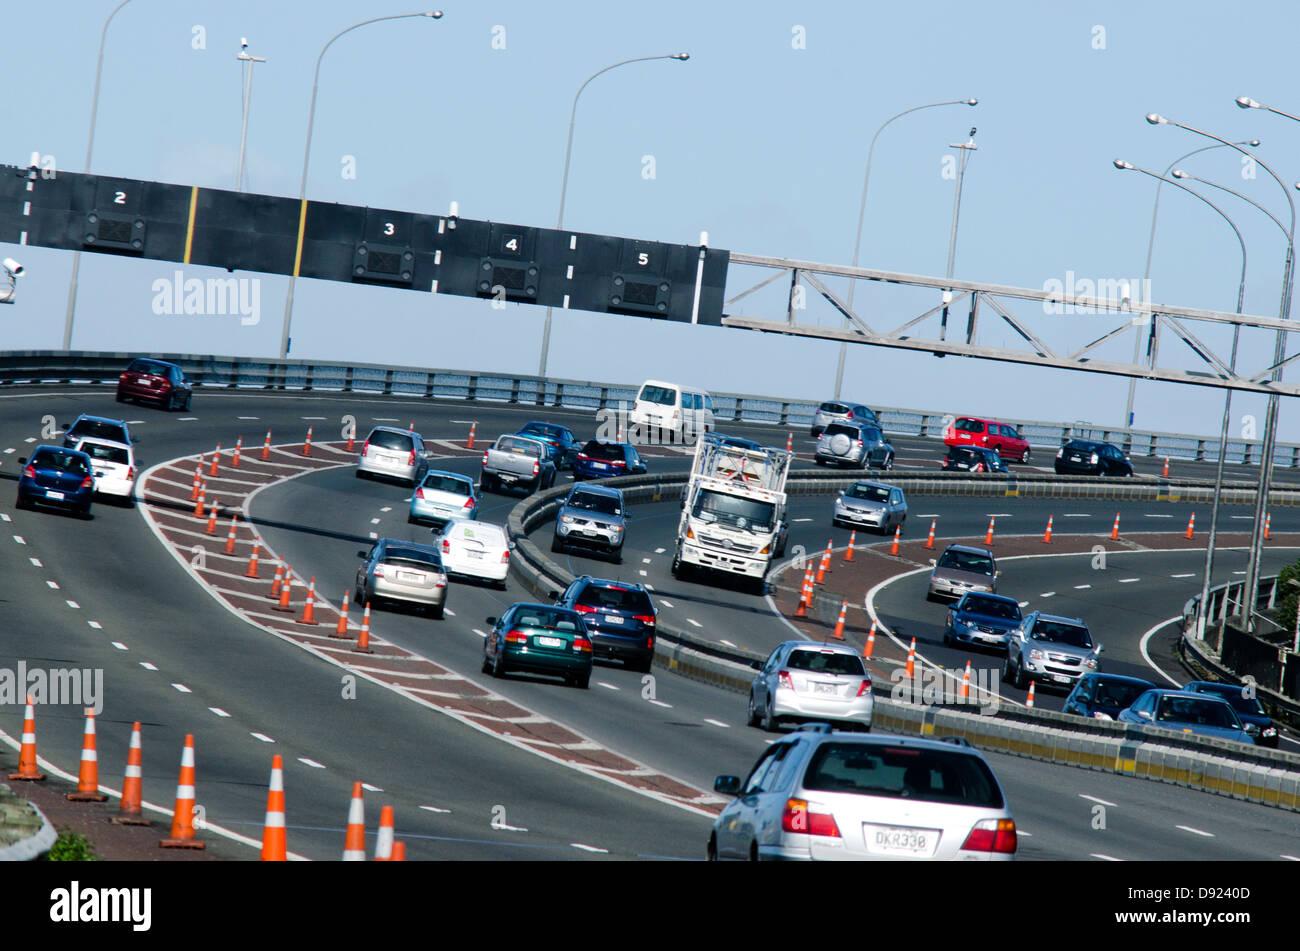 Traffic on Auckland Harbour Bridge, New Zealand - Stock Image